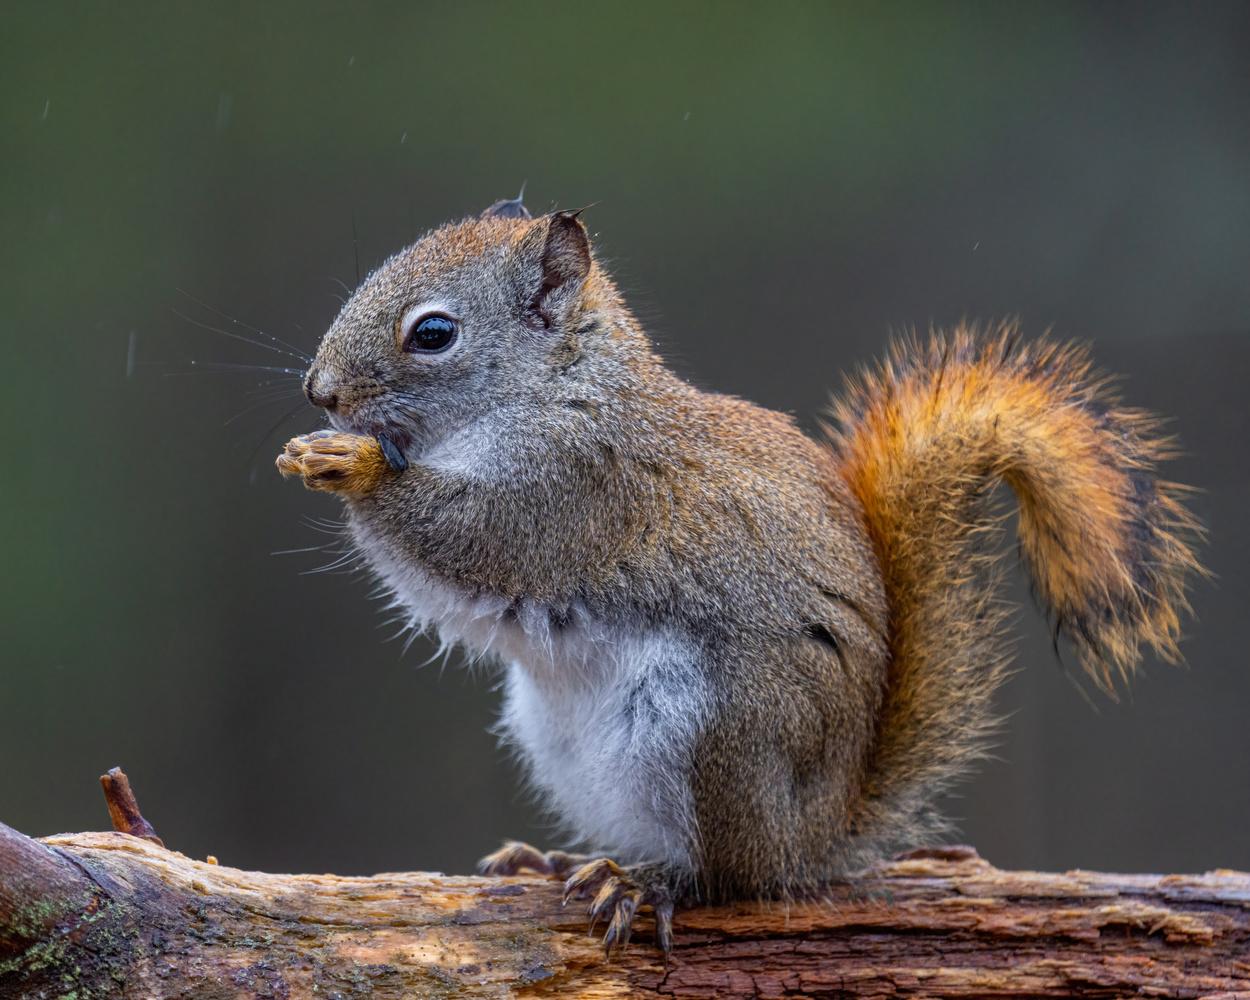 Squirrel in the rain by Skyler Ewing